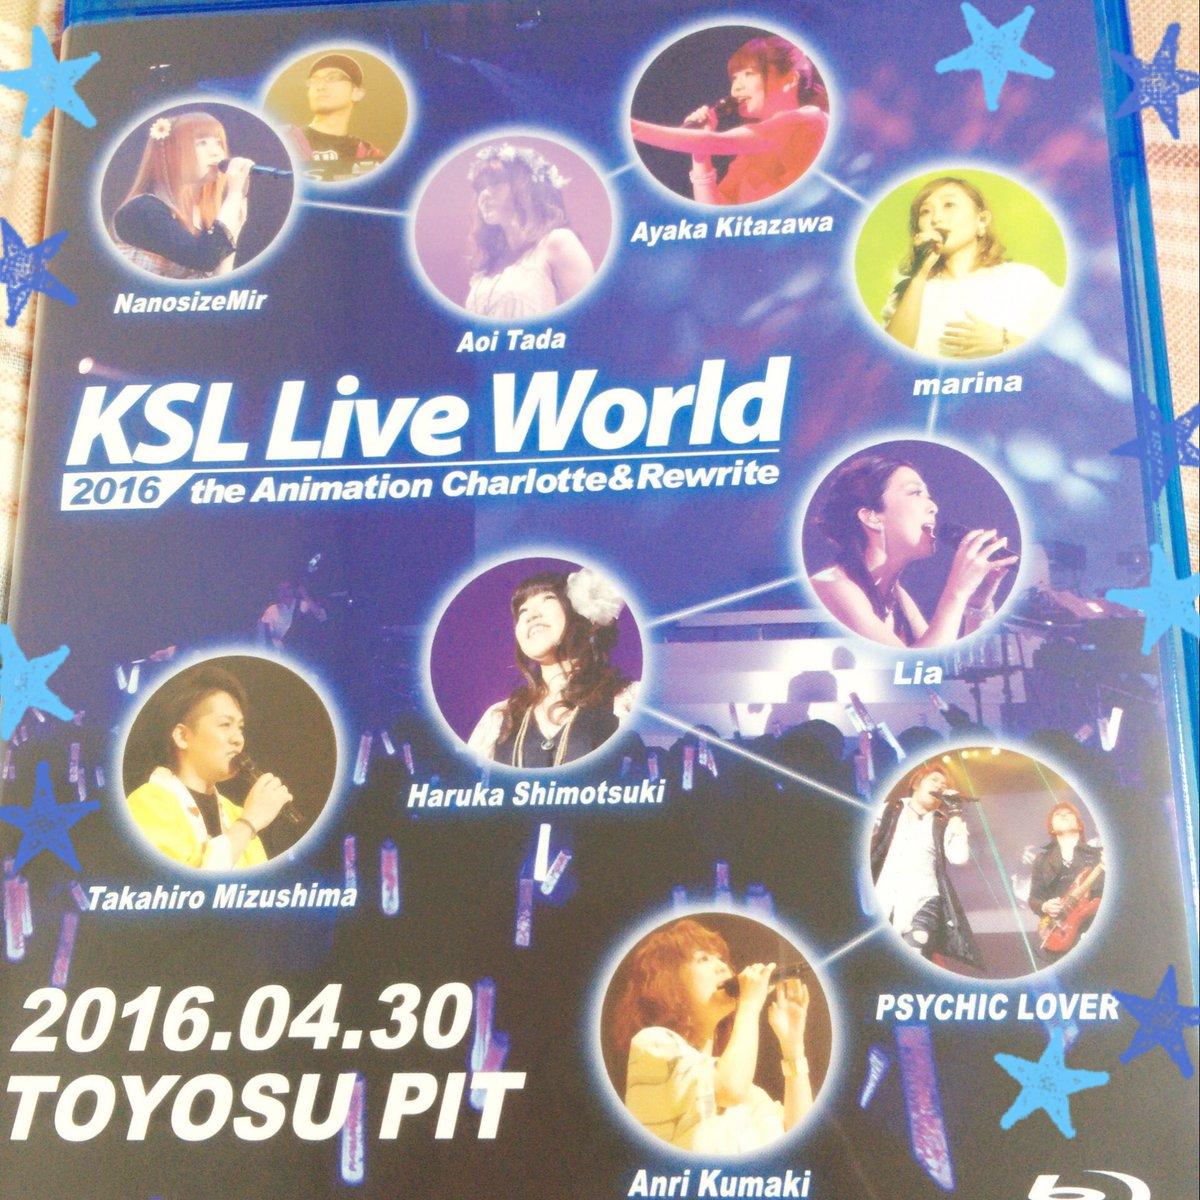 「KSL Live World 2016 ~the Animation Charlotte&Rewrite~」のBlu-